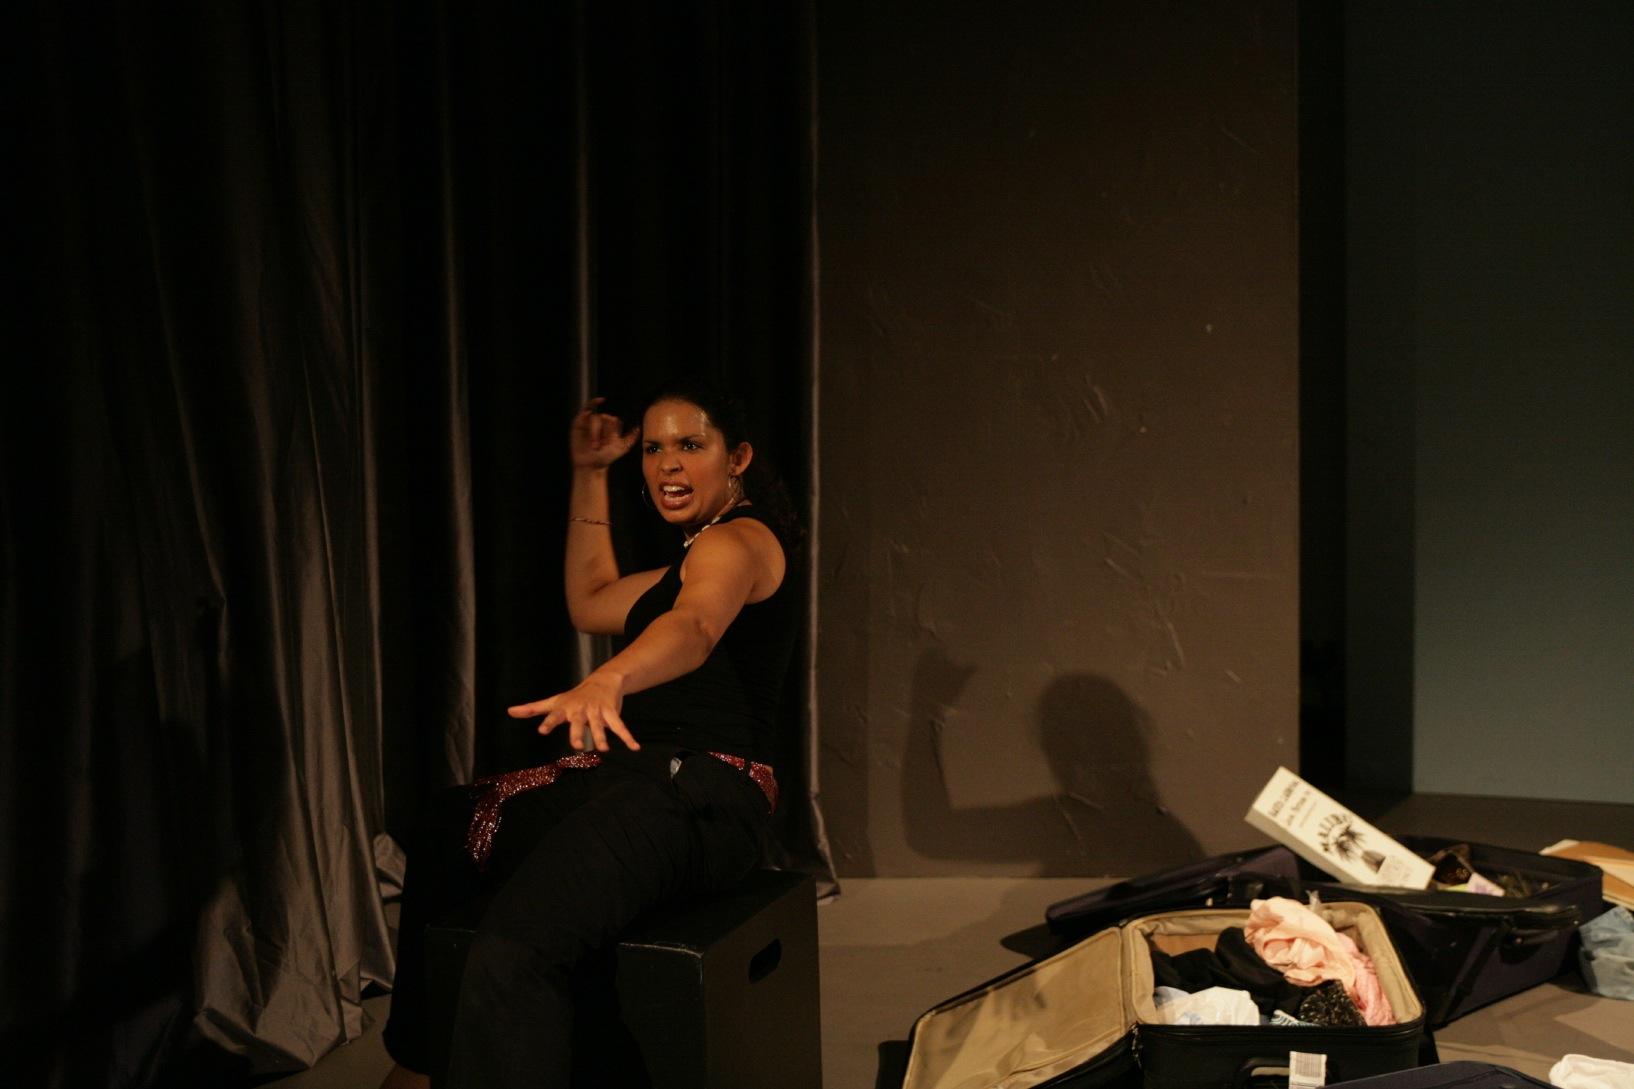 Caroline Taylor in Pack Light (New York International Fringe Festival, USA, 2006). Photo: Dixie Sheridan